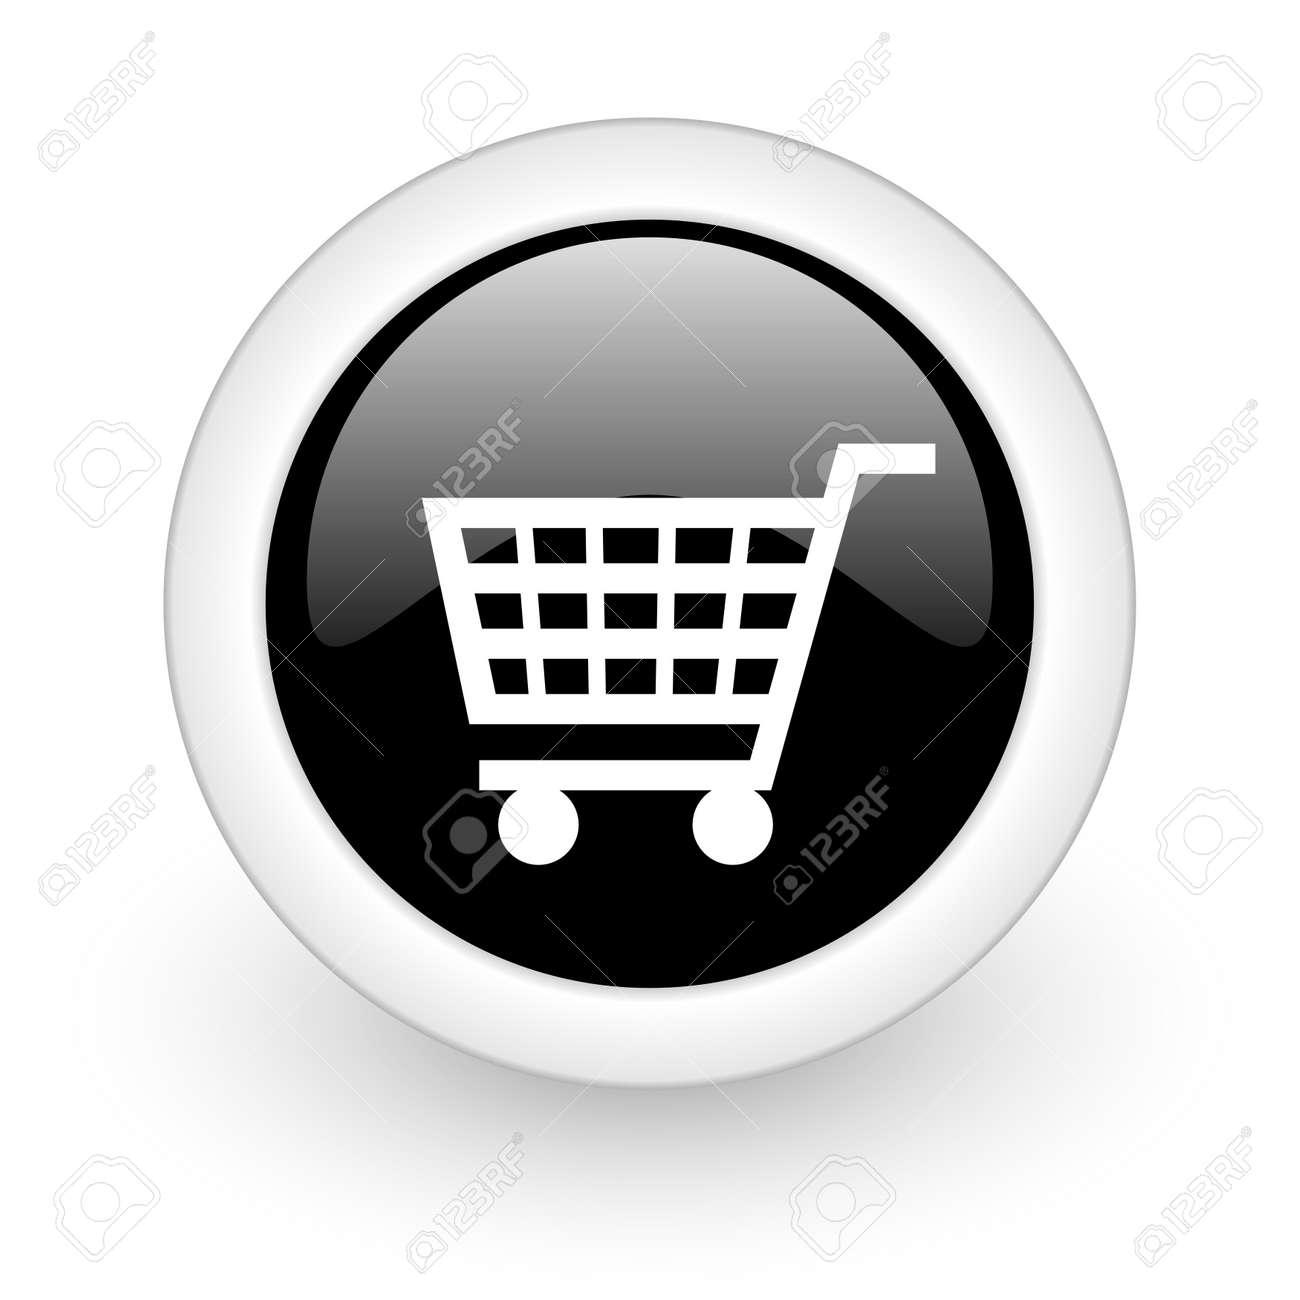 black round 3d icon Stock Photo - 13457591